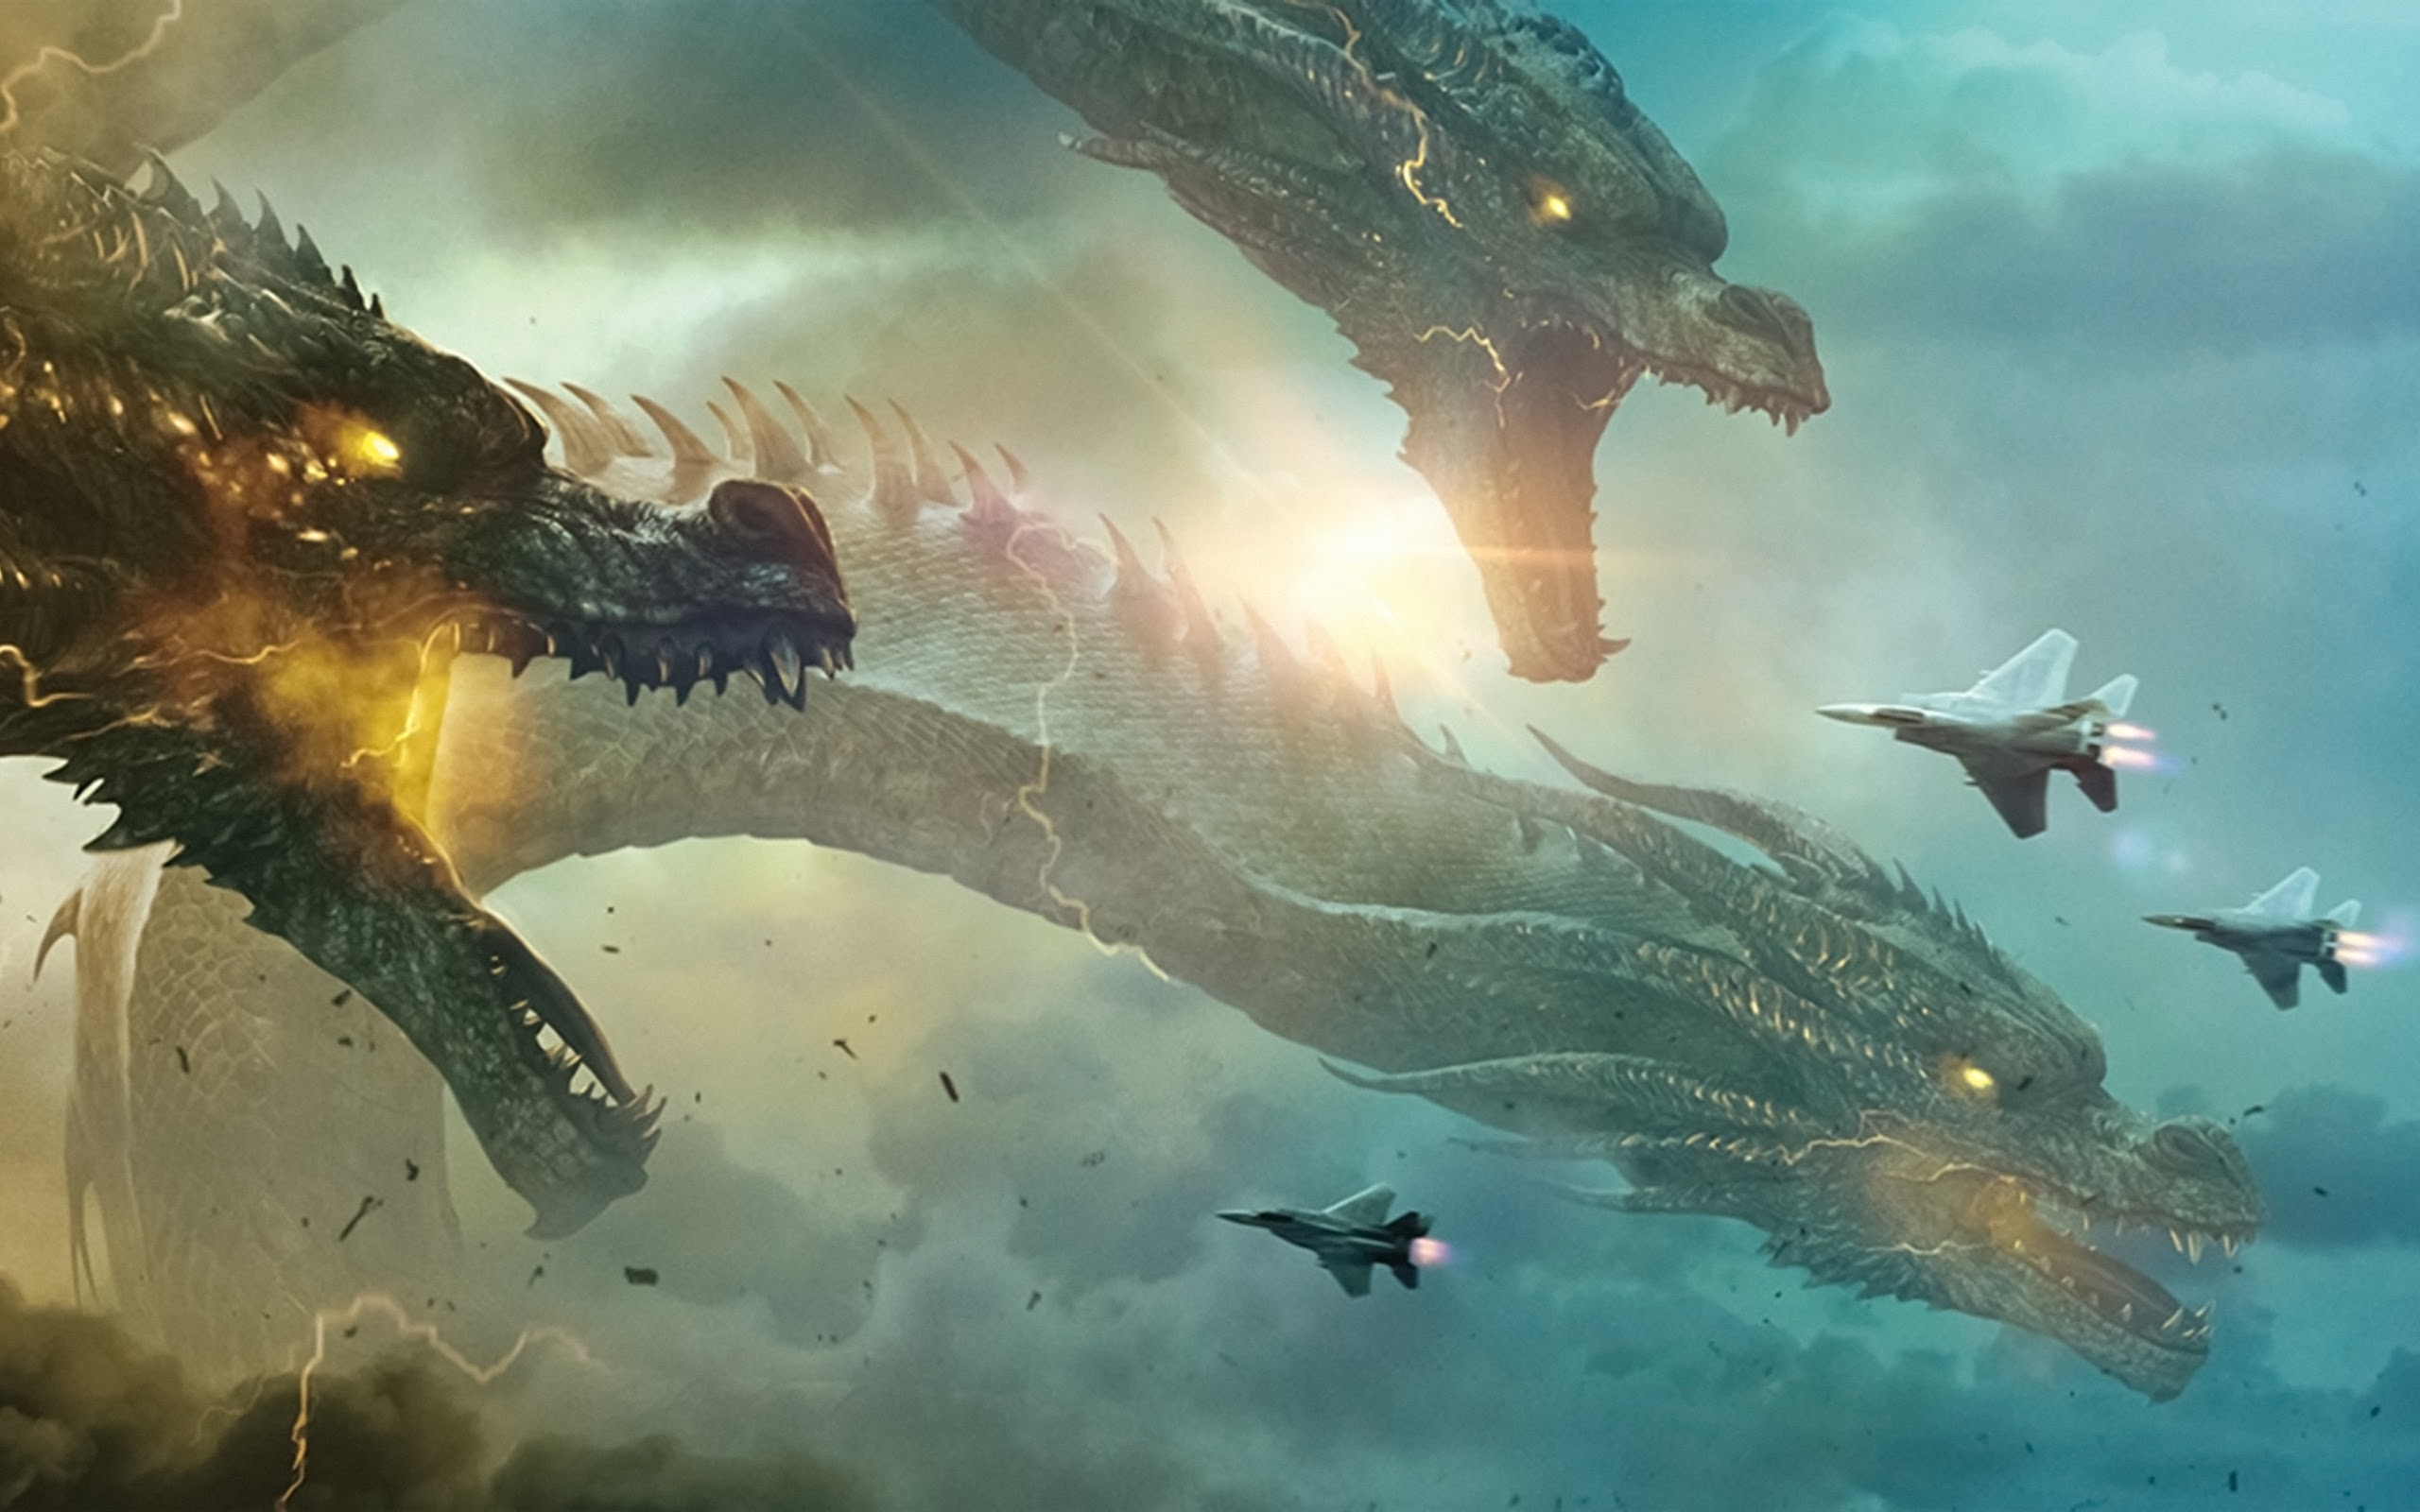 King Ghidorah Godzilla King of the Monsters 4K Wallpaper 19 2560x1600